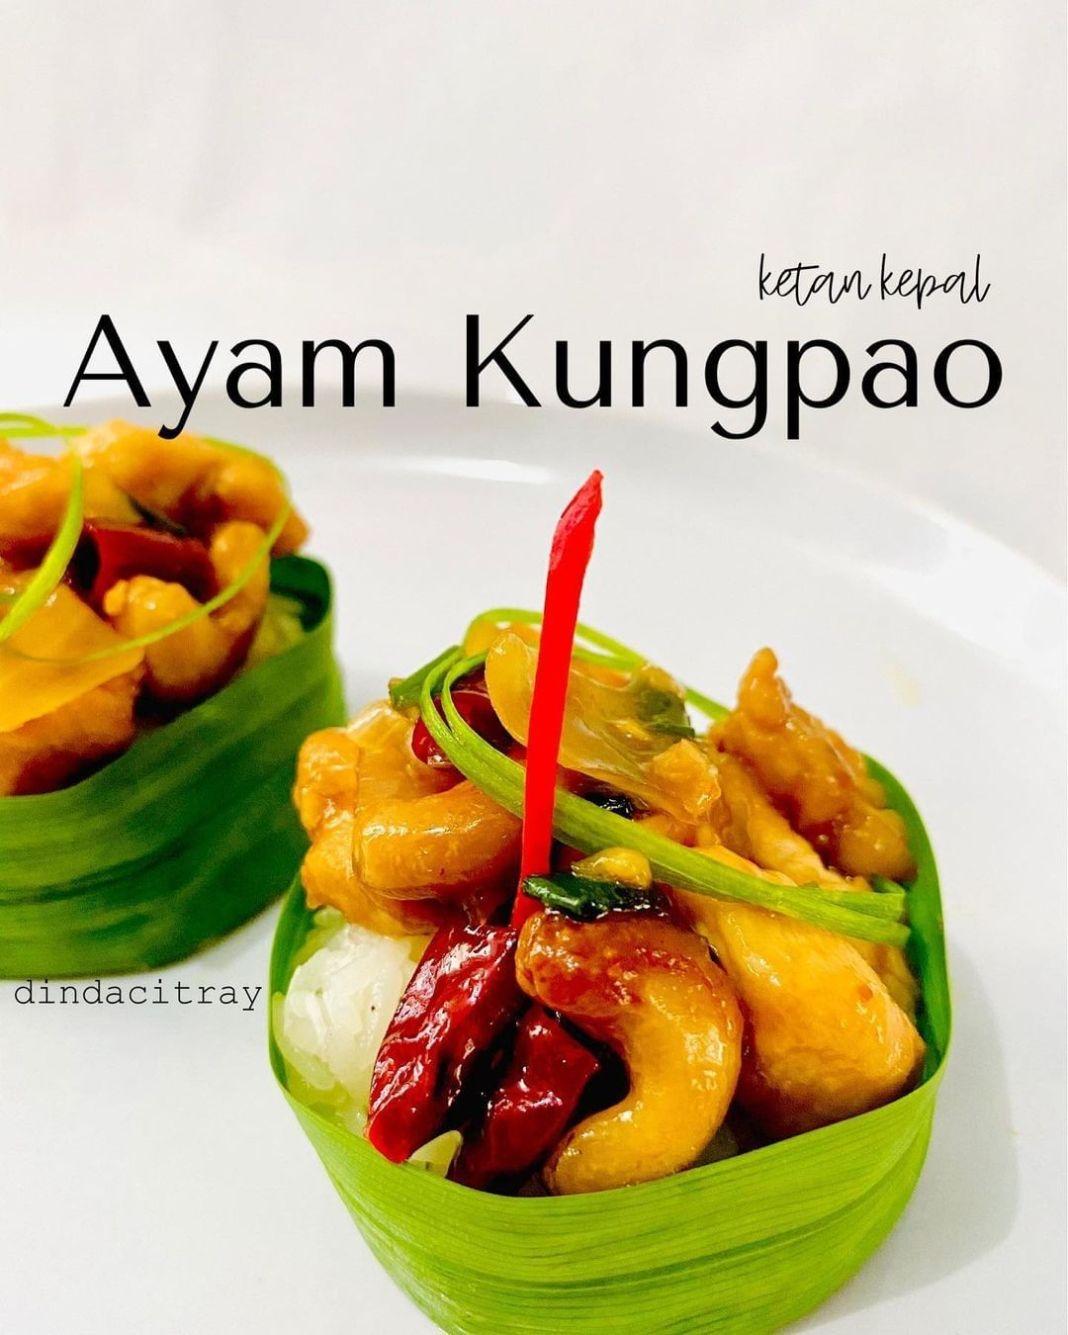 Info kuliner, Ayam Kungpao Kesukaan siapa nihh ayam kungpo? Gausa jauh jauh beli ke resto dehh  Ketan Kepal: …